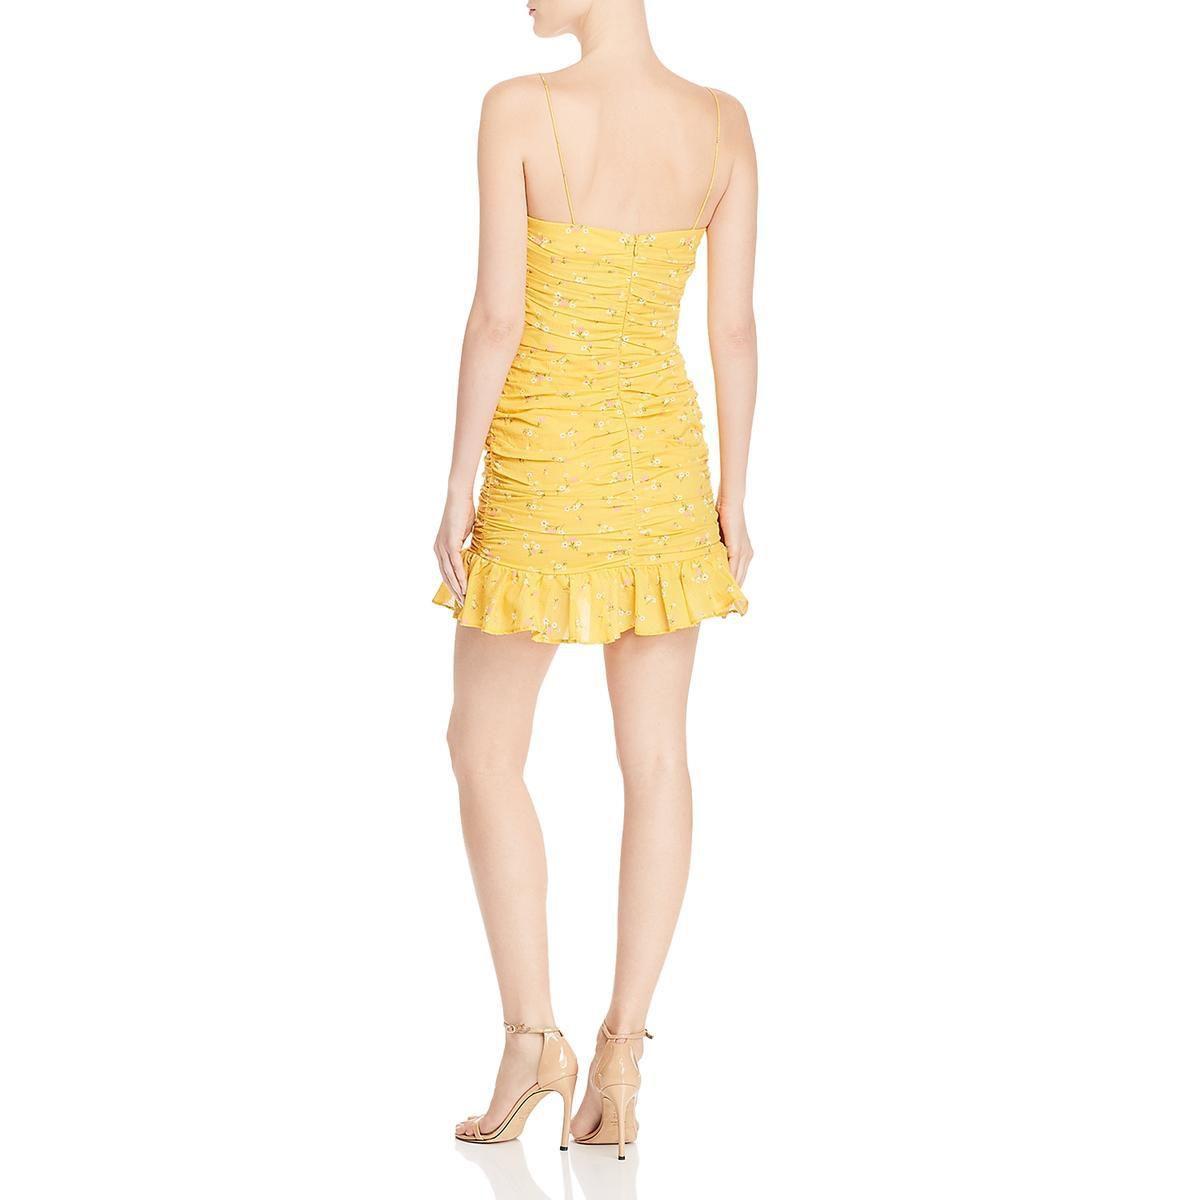 Bec + Bridge Womens Flounce Dress Yellow Size 8